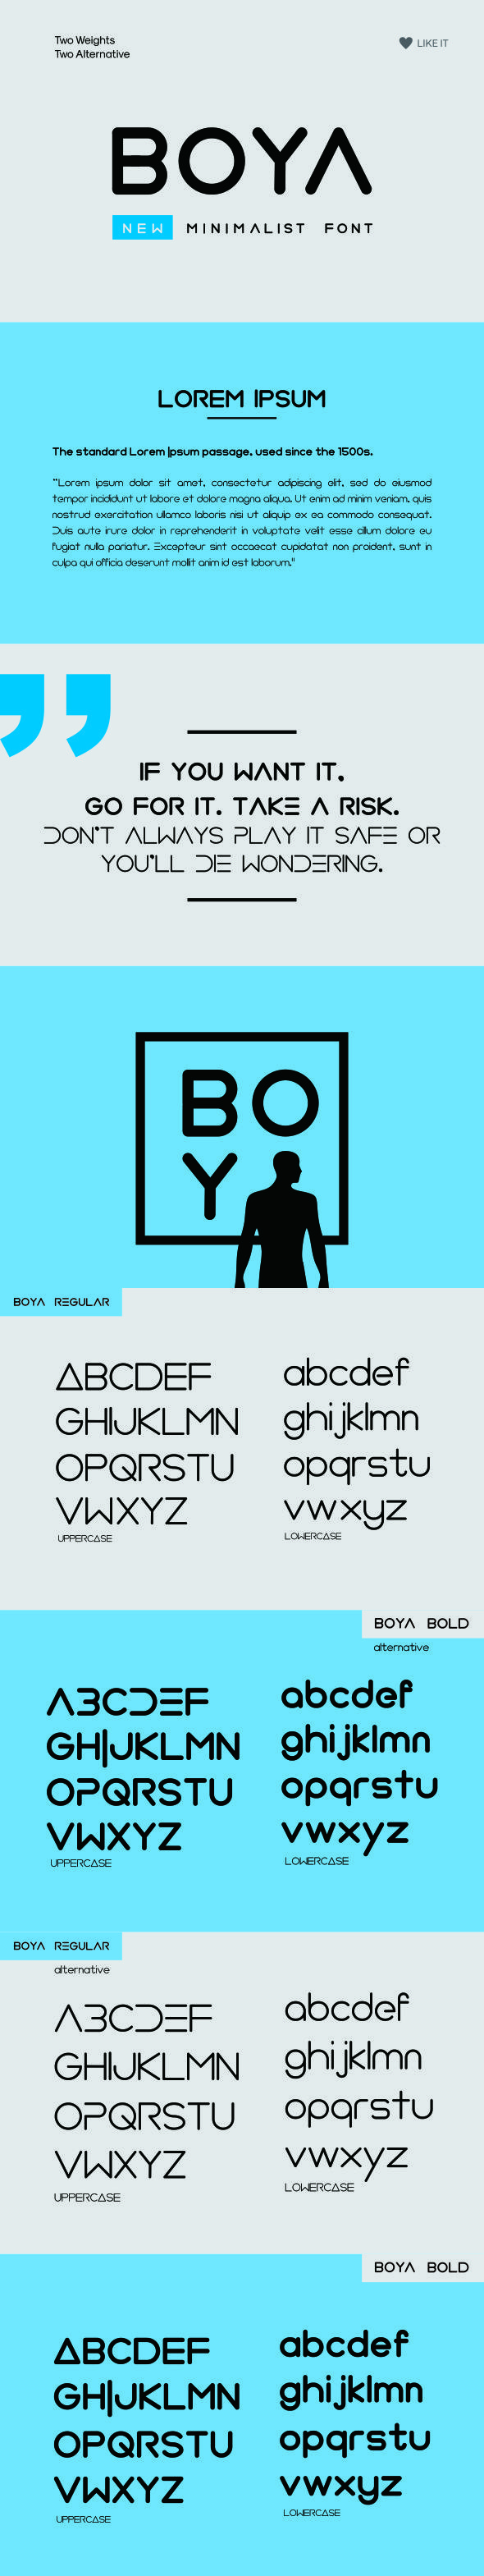 BOYA (Rounded Font) CREATIVE,SOLID,EXCLUSIVE FONT,SCI-FI,SCI,FUTURISTIC,GEOMETRIC,HEADLINE,LIGHT,LOGO,LUXURY,MINIMALIST,MODERN,MONO,LINE,SANS SERIF,SANS-SERIF,BOLD,SIMPLE,SLIM,STYLISH FONT,THIN,TITLE,ROUND,ROUNDED,ROUND FONT,BOYA